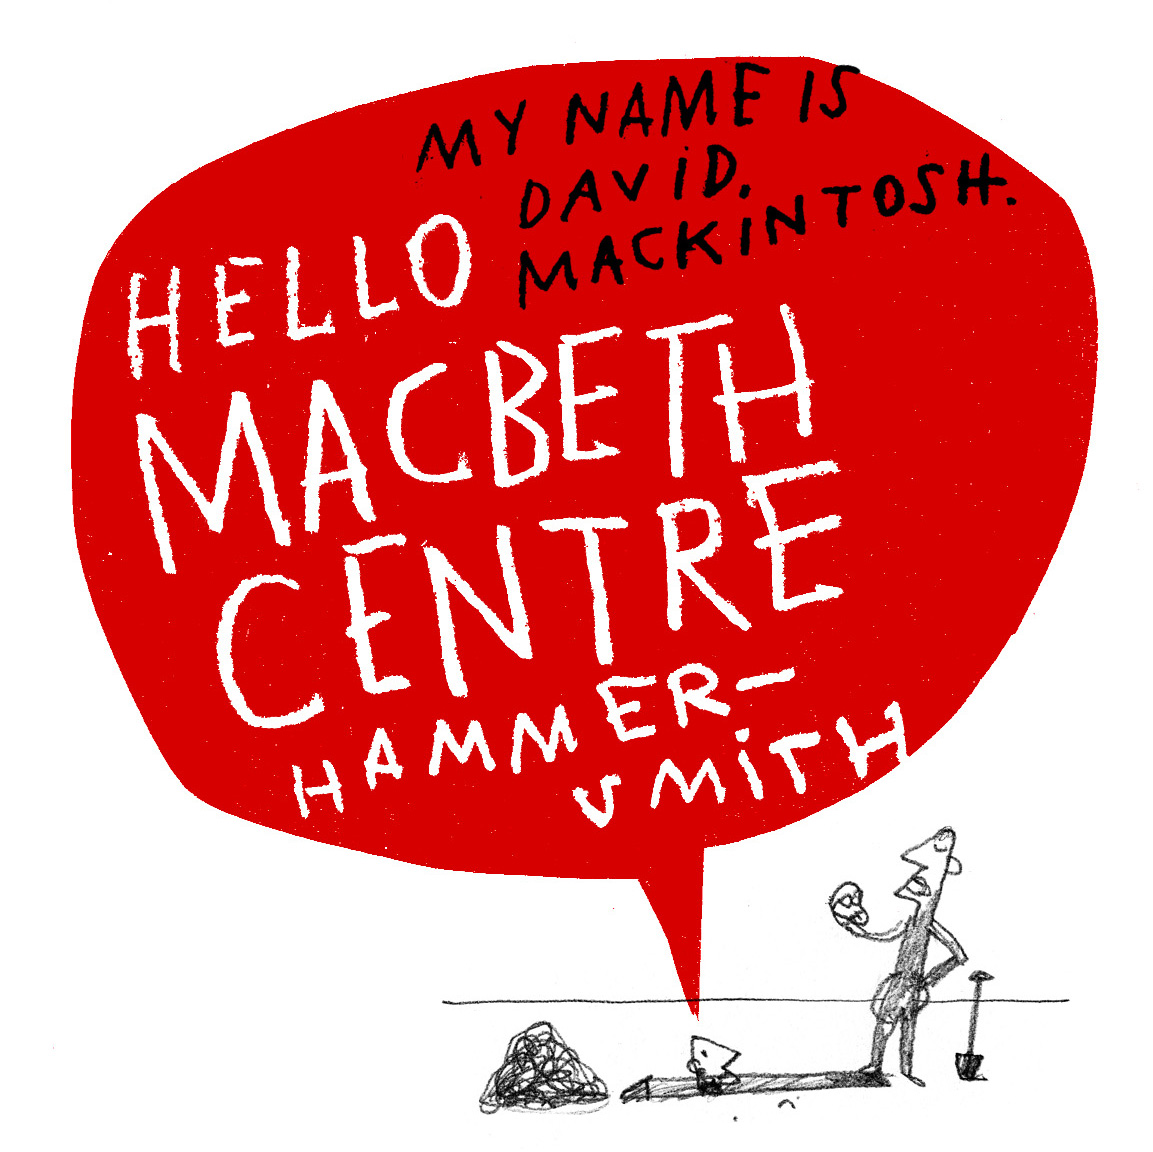 macbeth talk